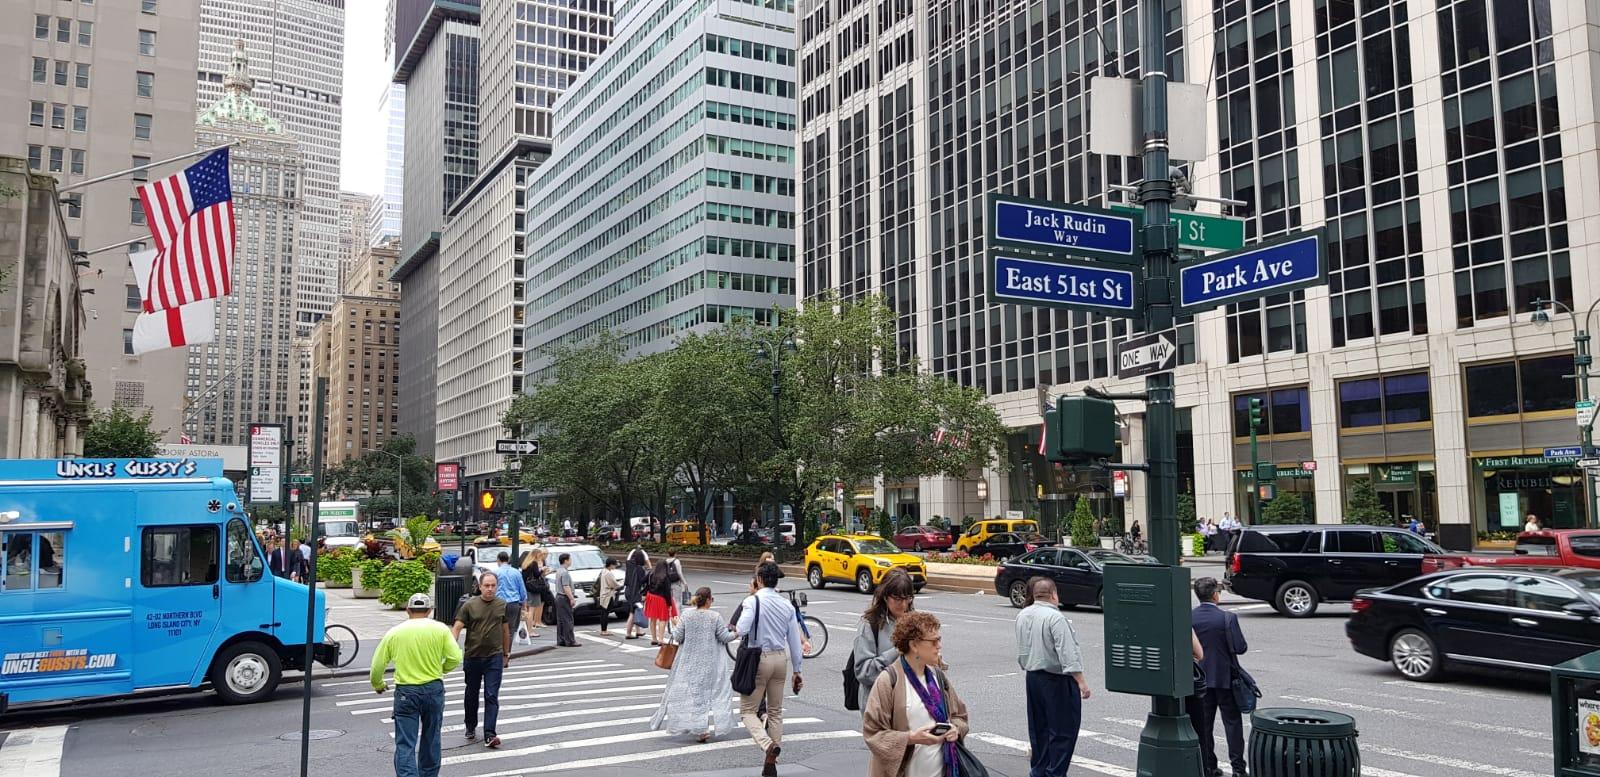 Irish Consulate on Park Avenue, New York